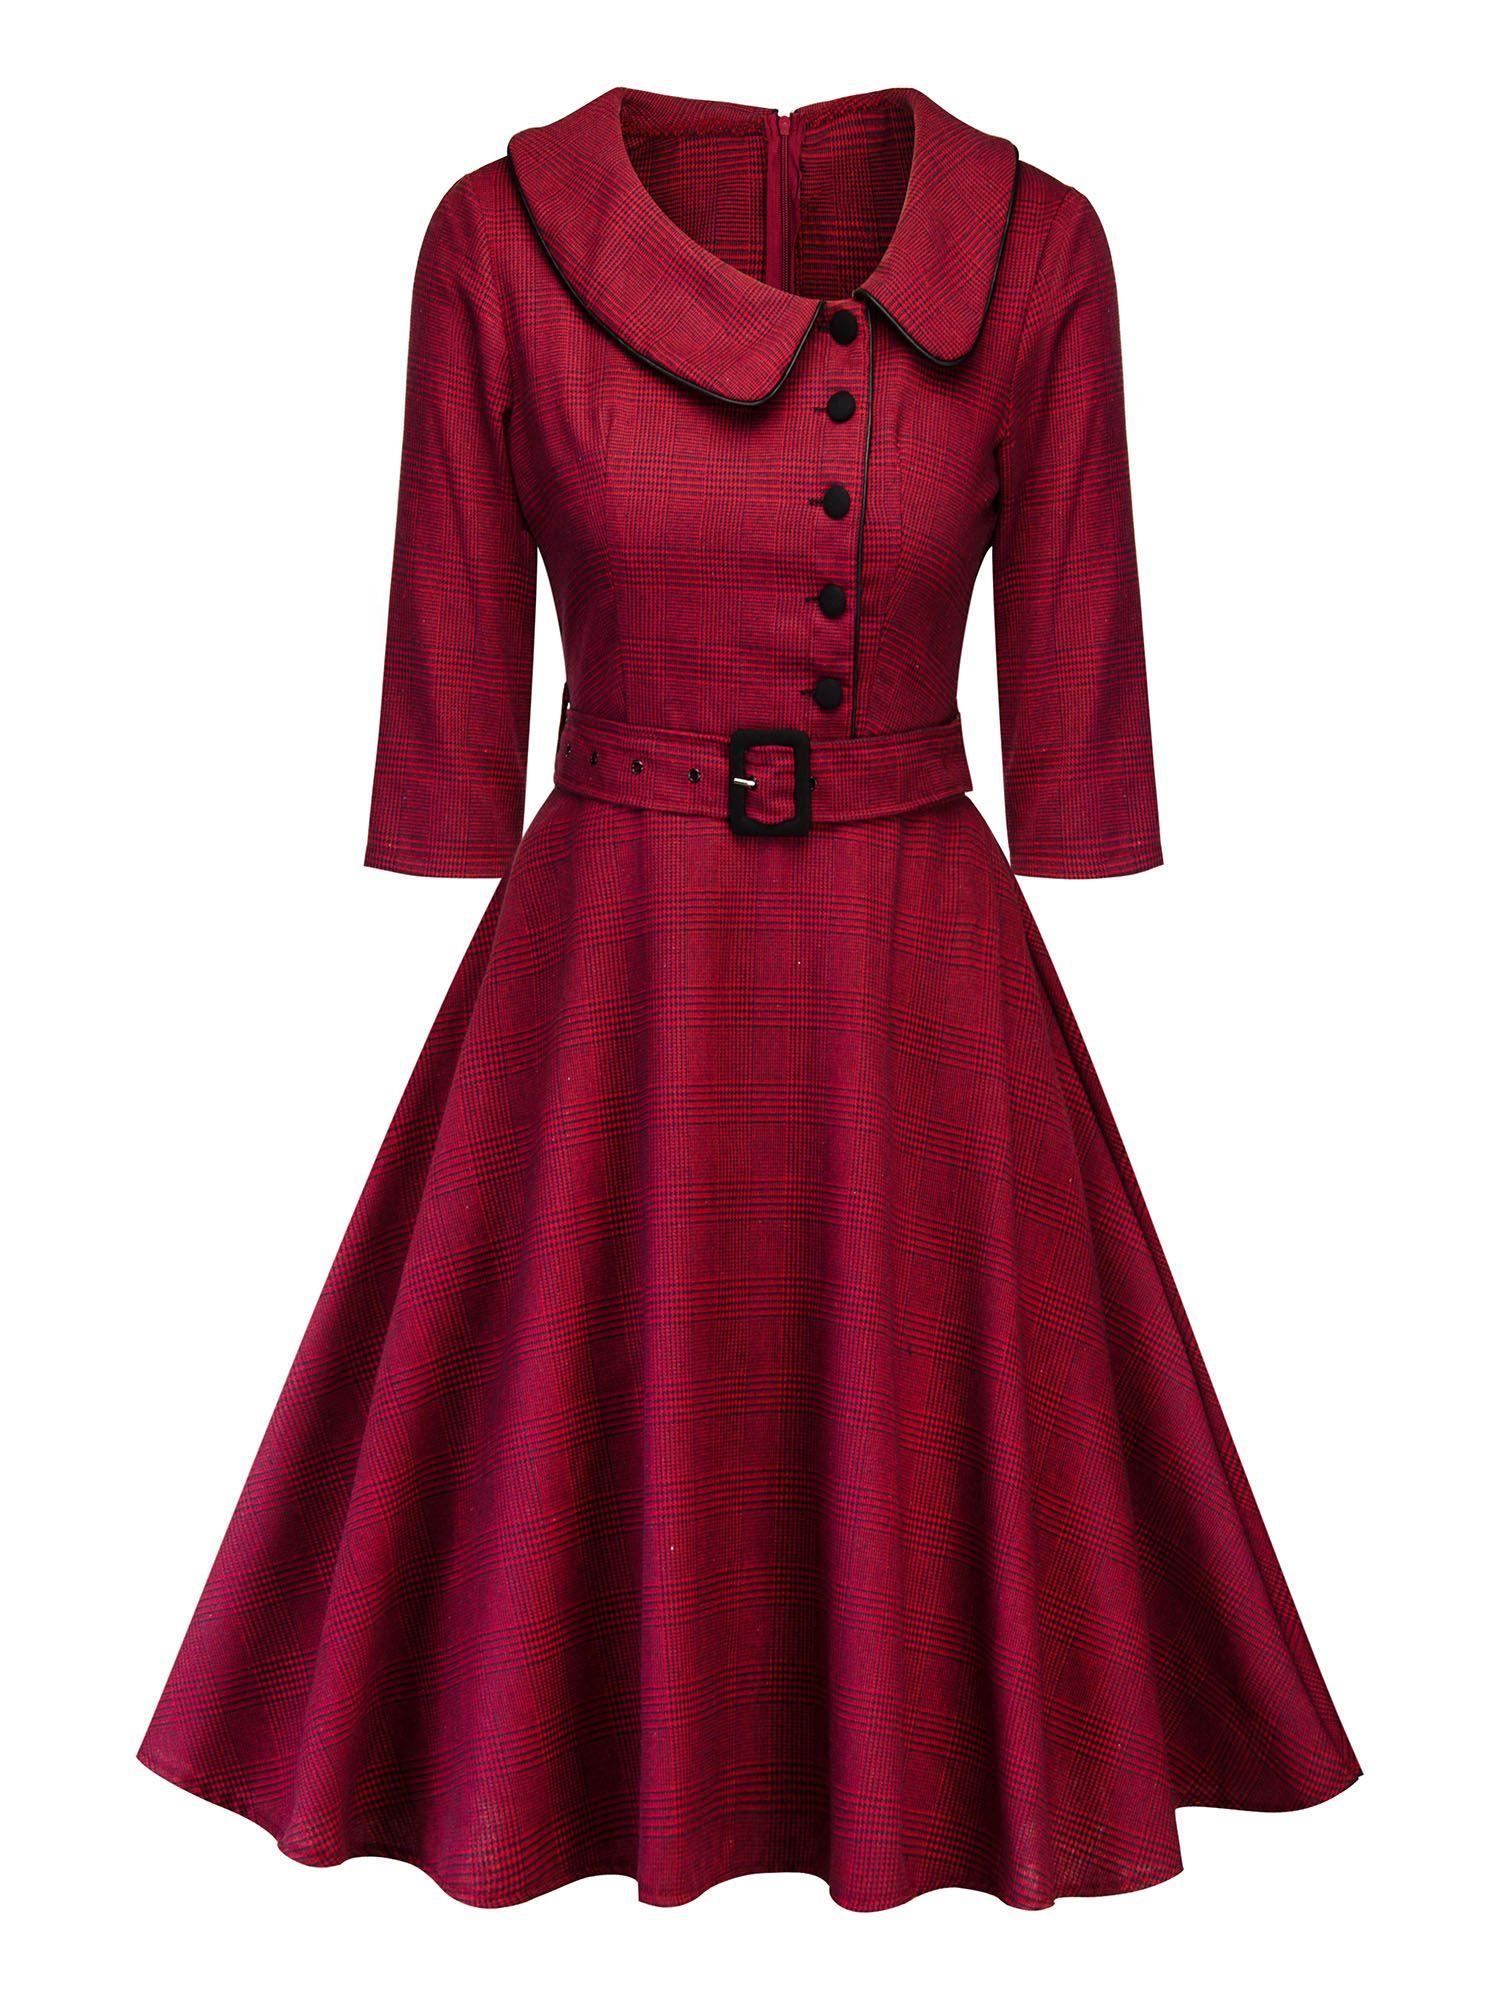 Himone Women Button Lapel Swing Dress Vintage Long Sleeve Rockabilly Cocktail Evening Party Housewife Dresses Waistband Walmart Com Housewife Dress Vintage Dresses Vintage Red Dress [ 2000 x 1500 Pixel ]